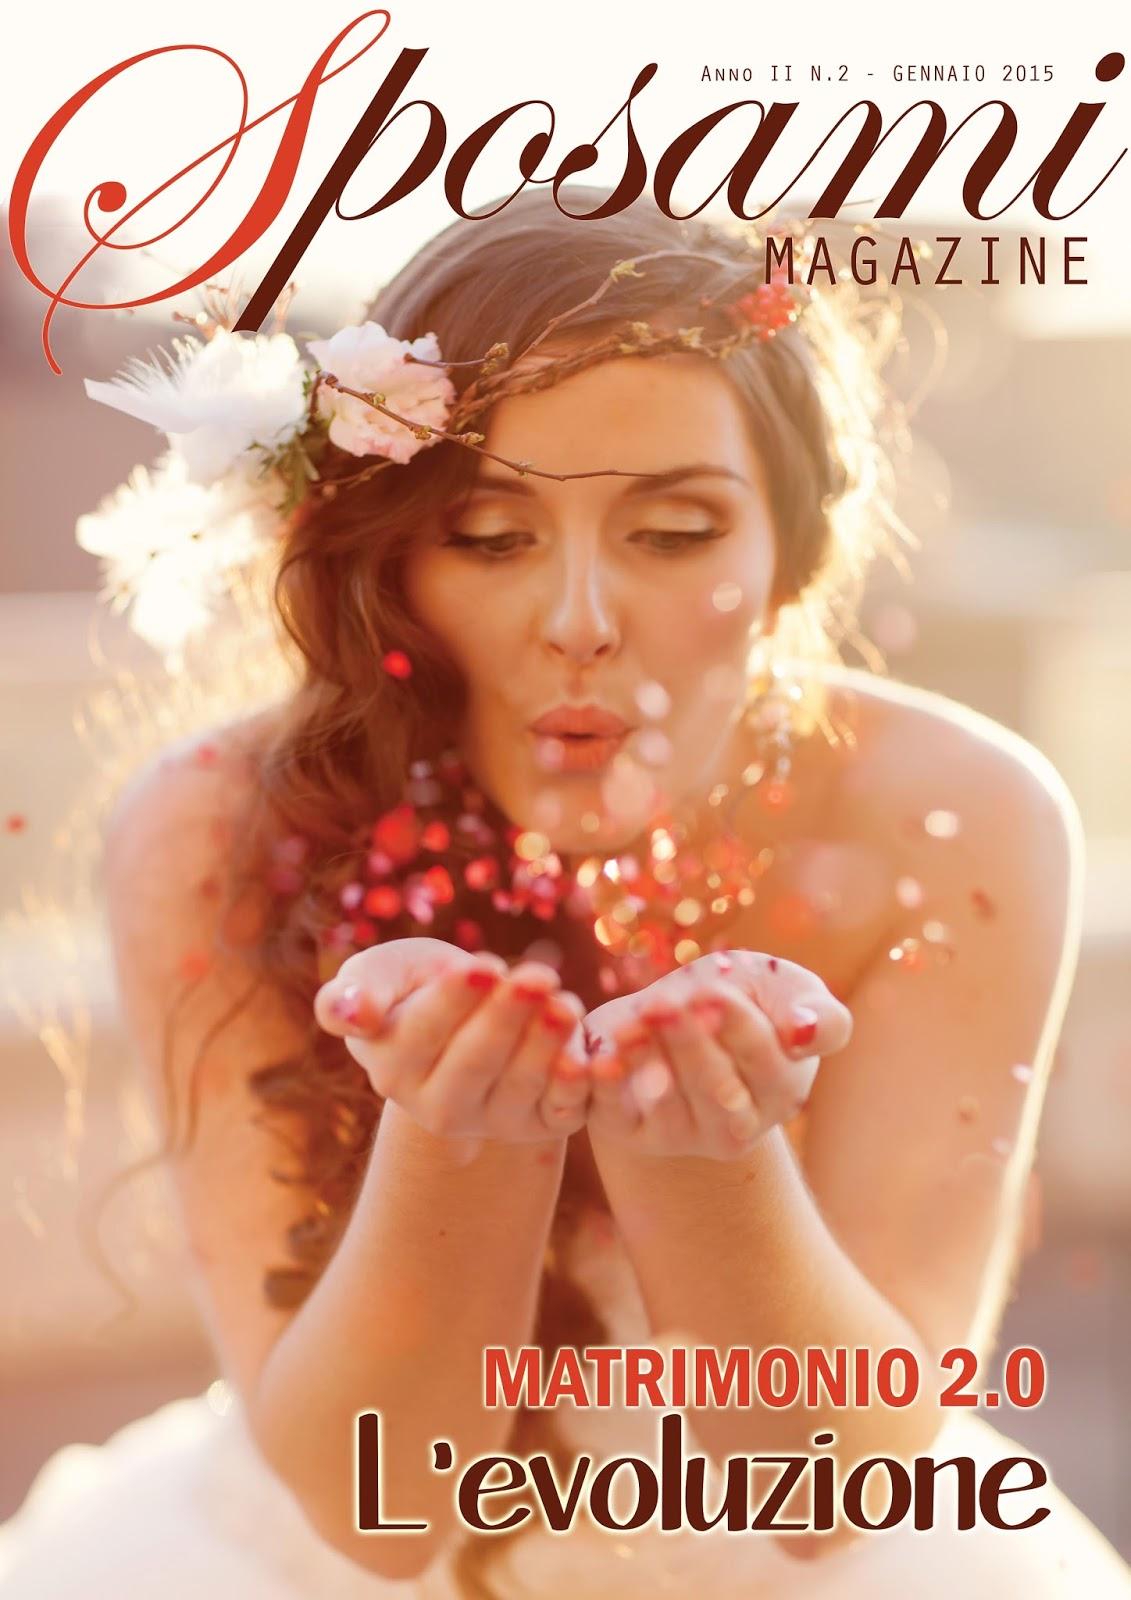 http://issuu.com/sposamioggi/docs/magazine2015